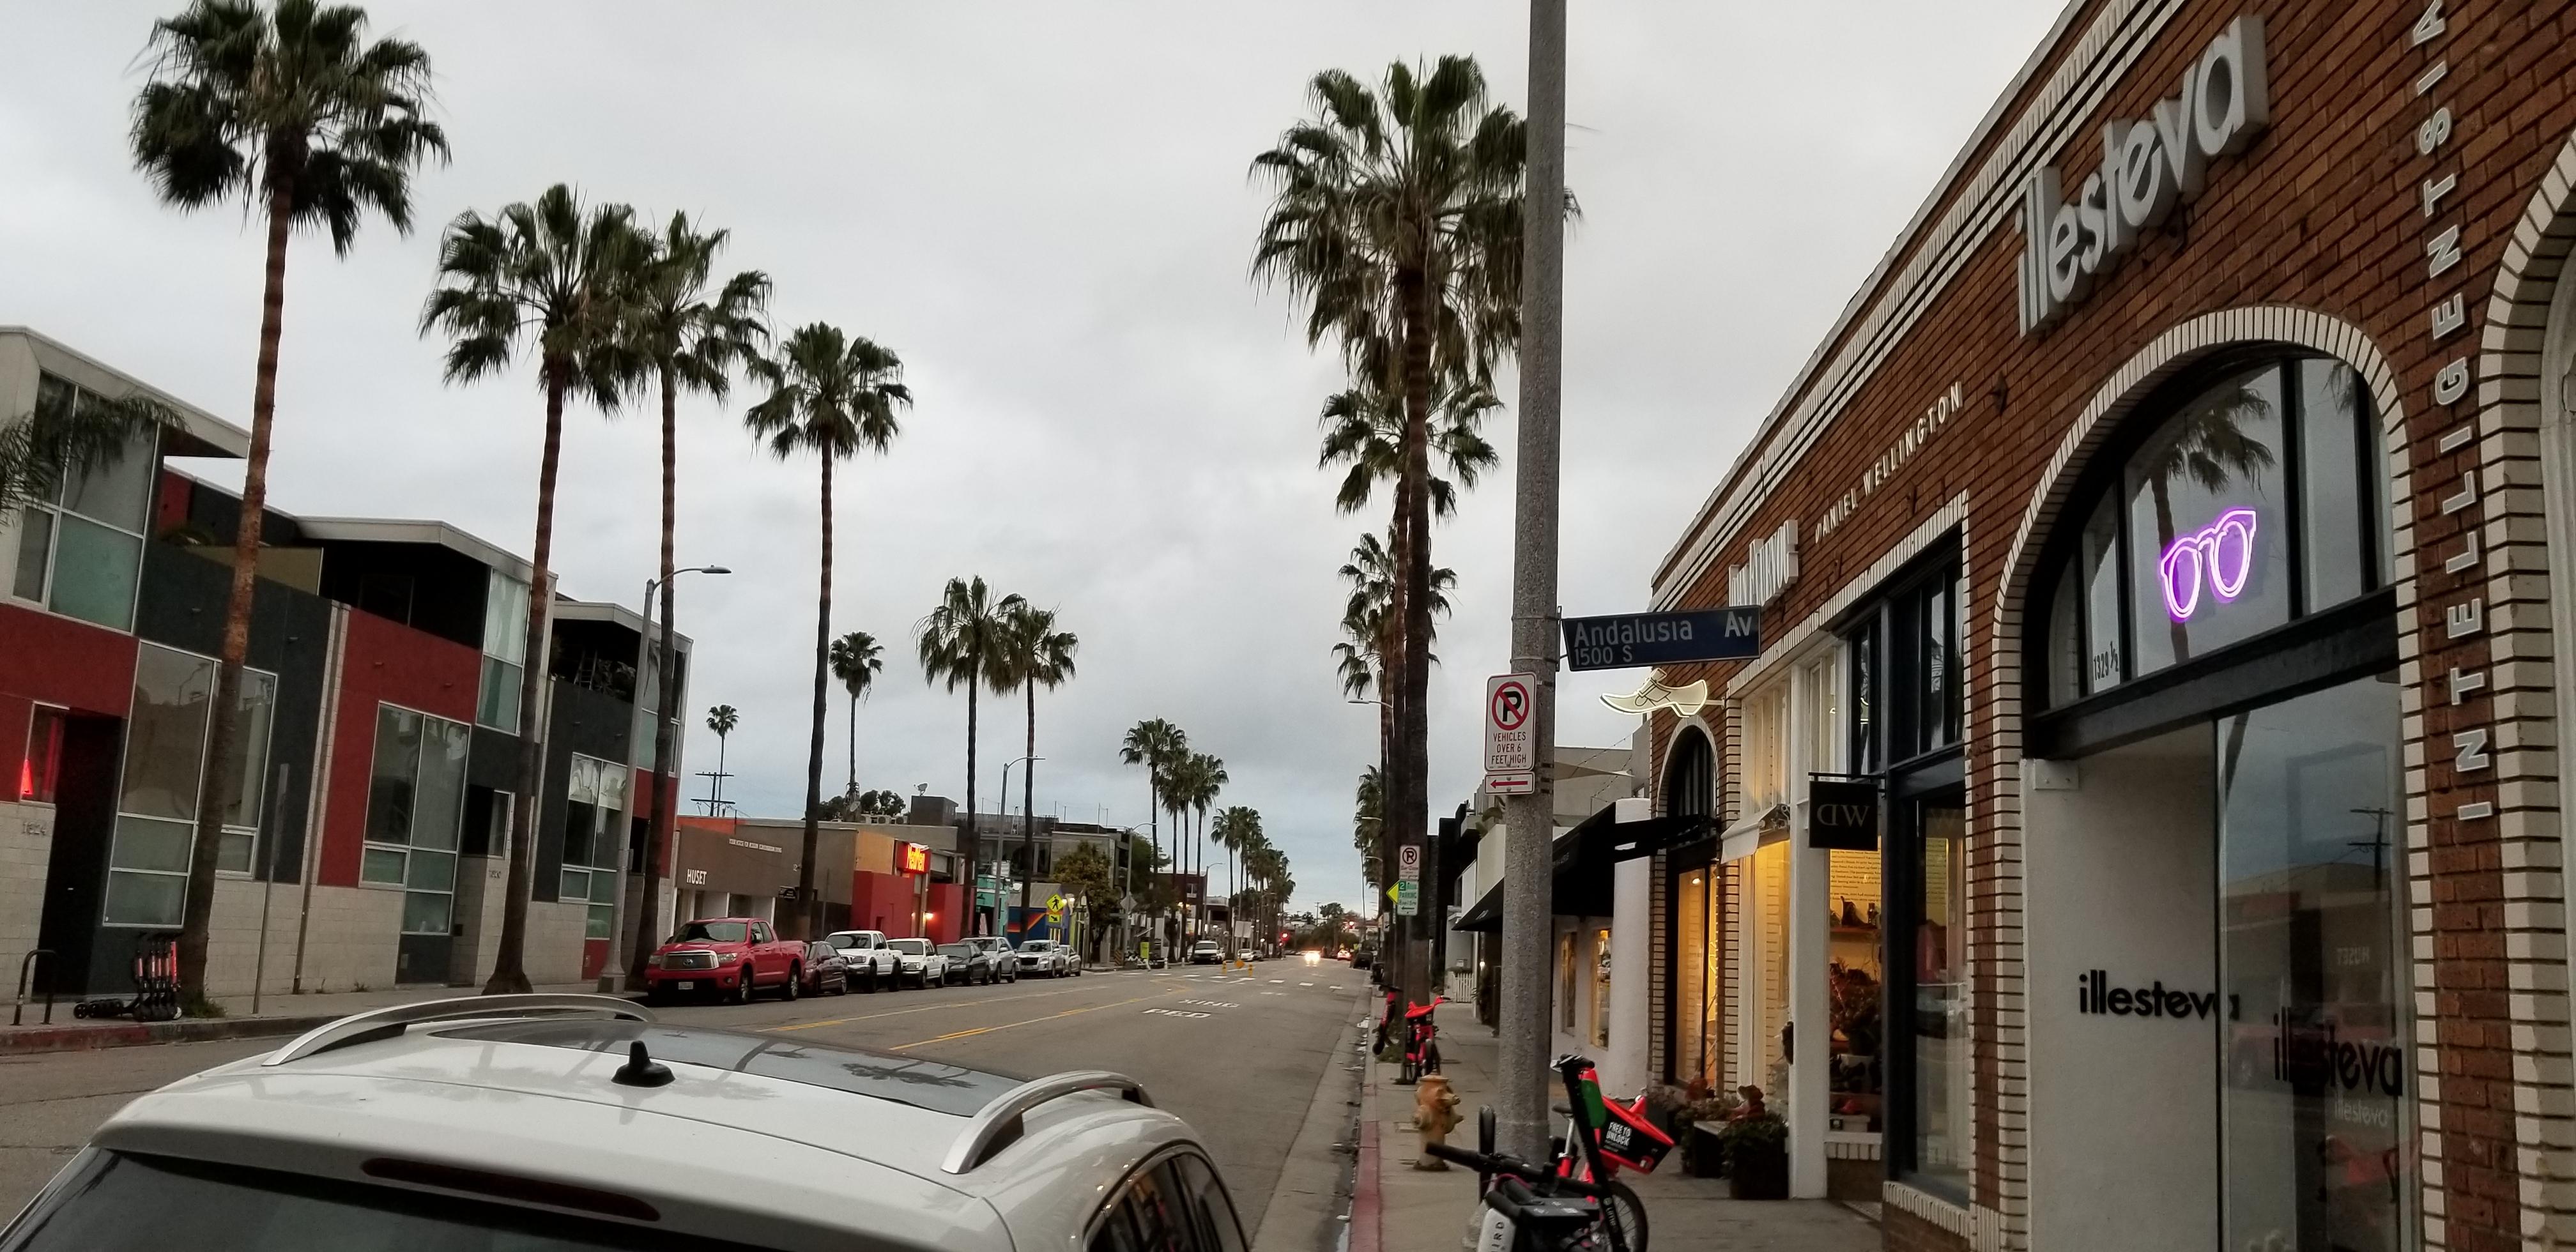 Abbott Kinney Venice Beach